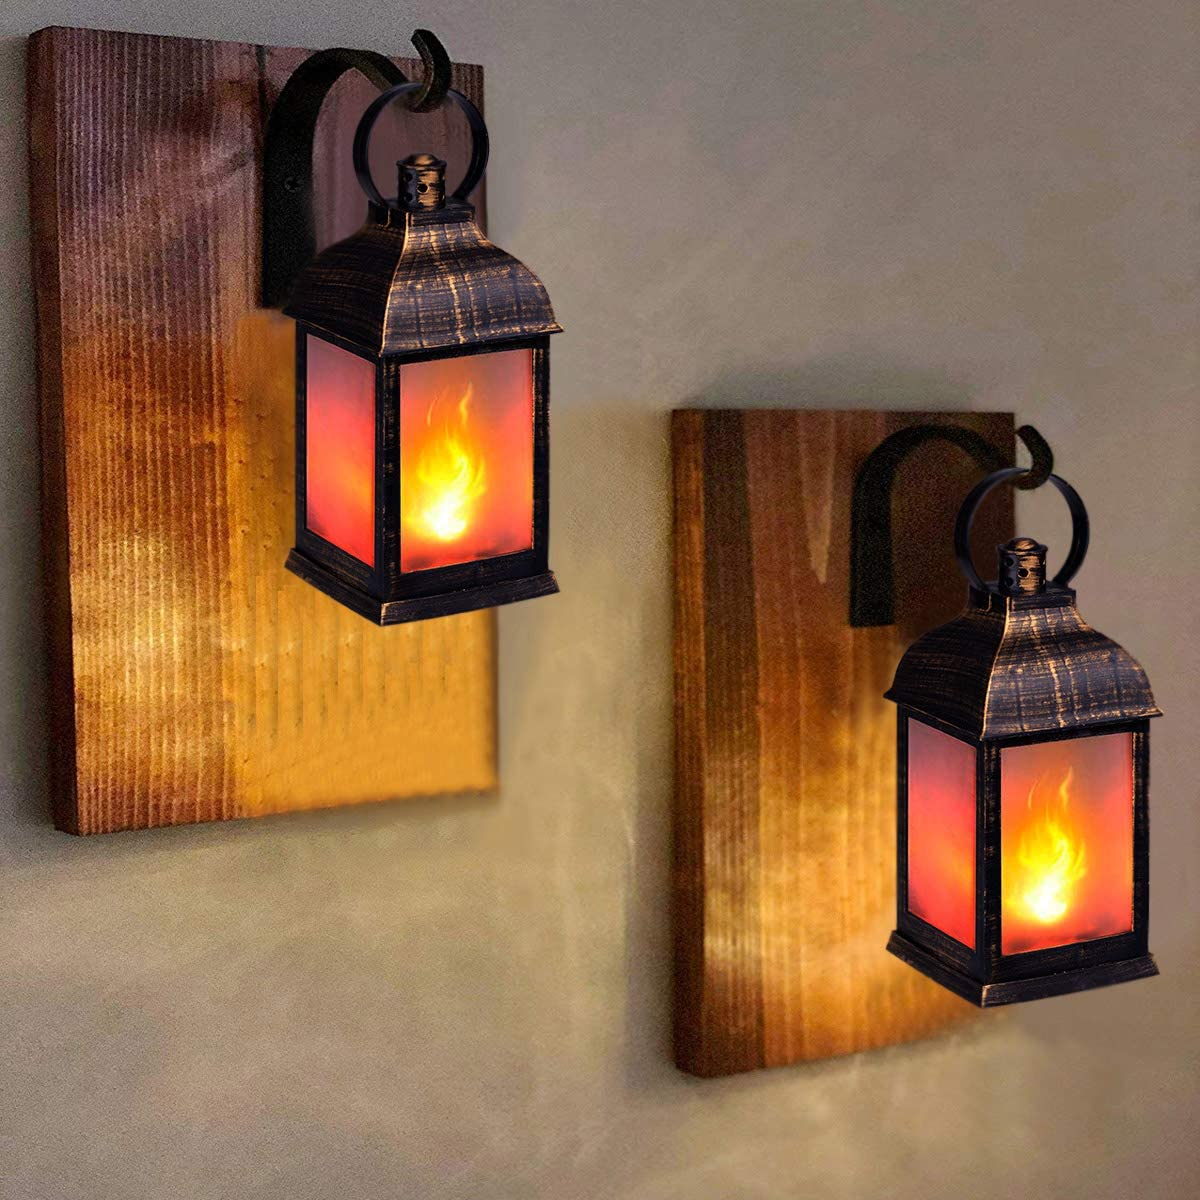 Set of 4 Indoor Lanterns Decorative,Outdoor Hanging Lantern,Decorative Lanterns Golden Brushed Black,Remote Timer zkee 11 Vintage Style Decorative Lantern,Flame Effect LED Lantern,